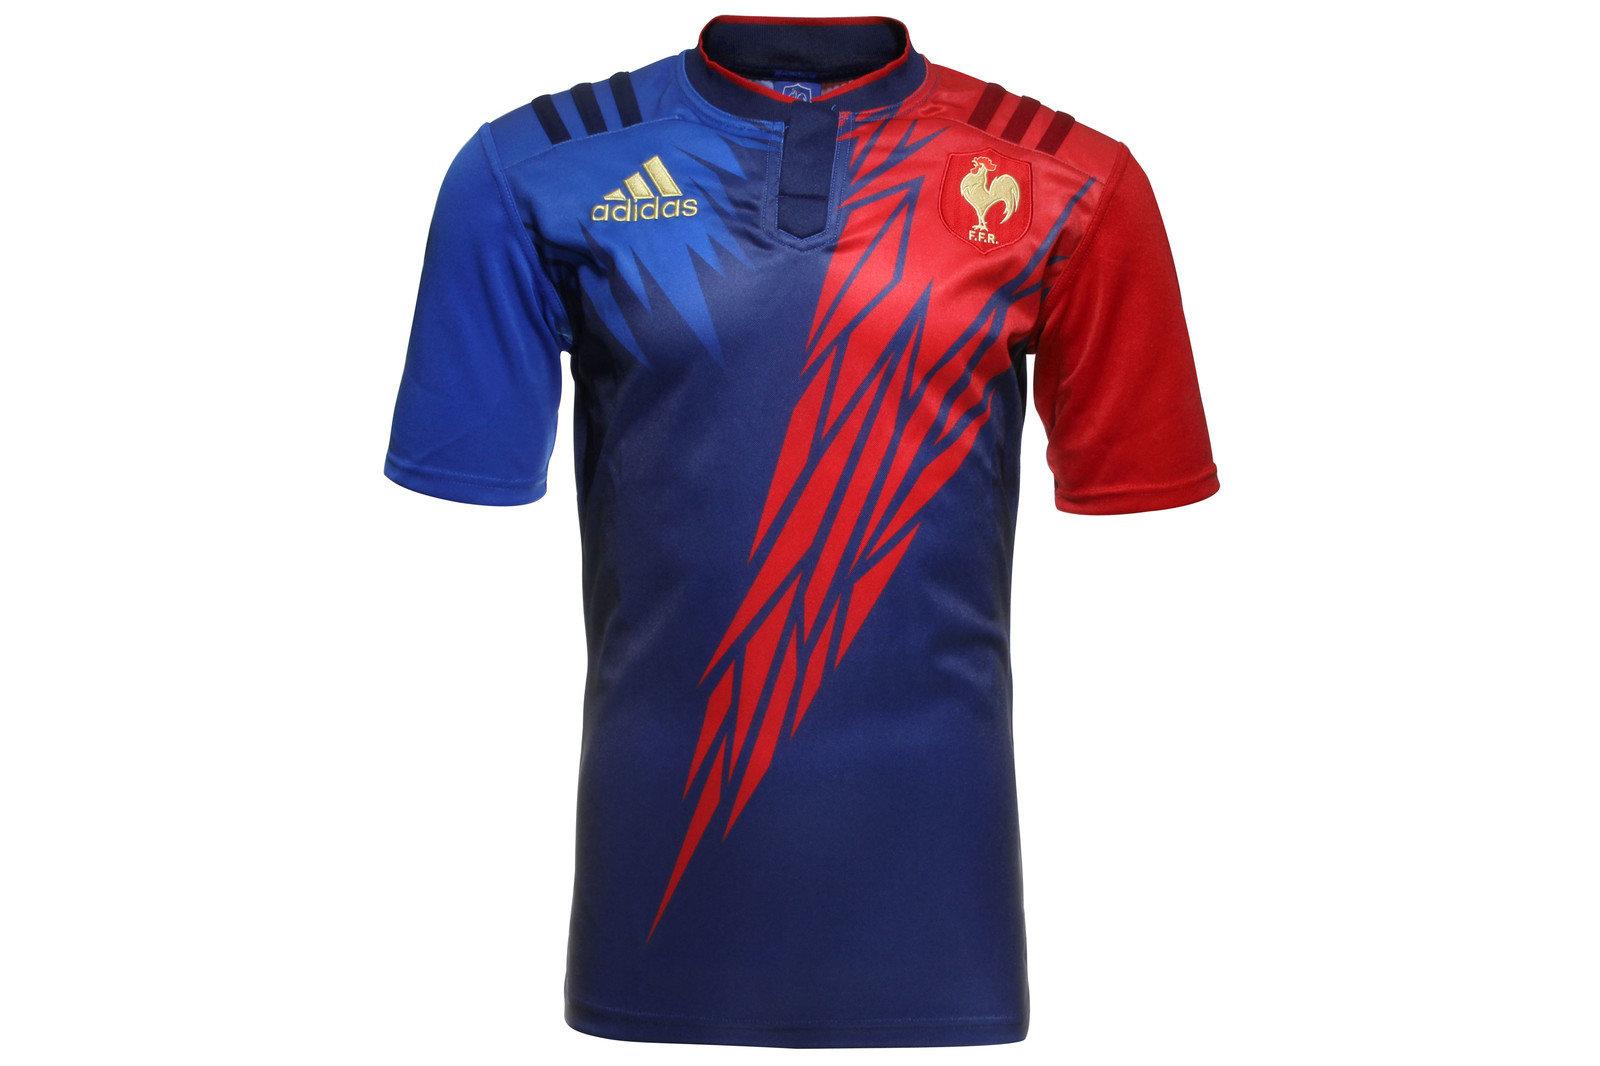 e4dbebf23fb adidas Mens France 7s 2014/15 Home S/S Replica Rugby Shirt Top Sports  Training